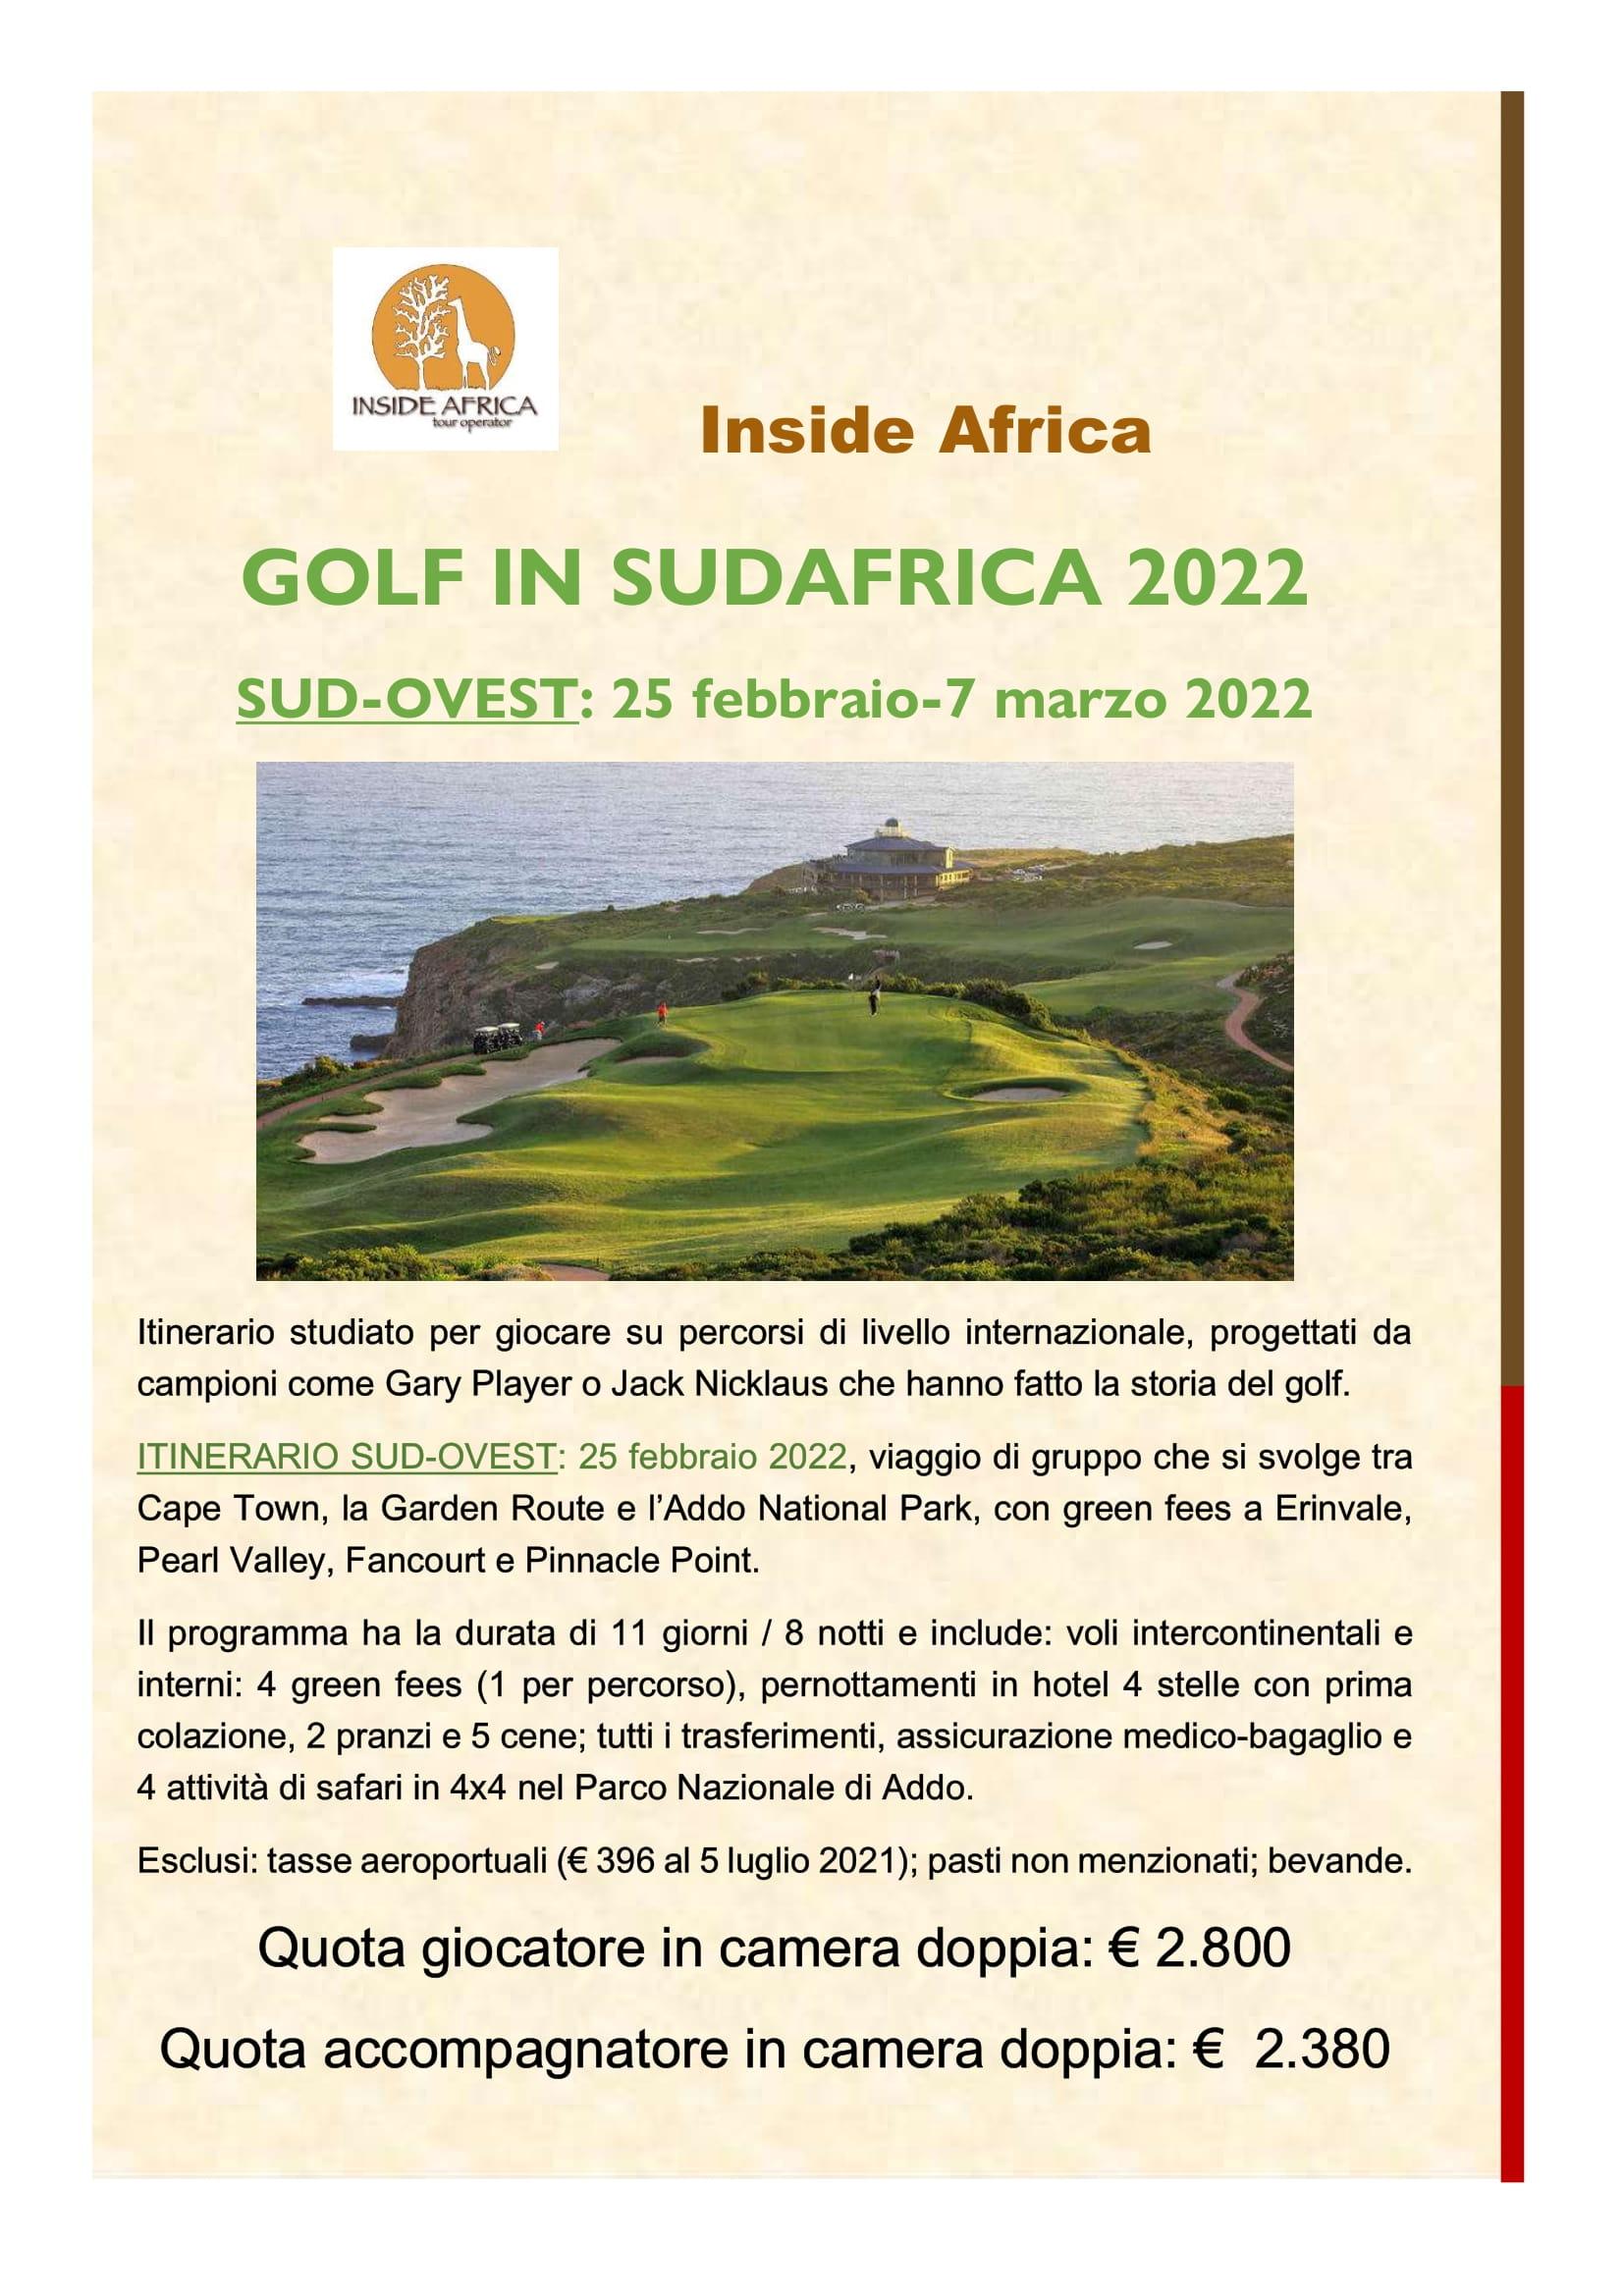 volantino-golf-25-febbraio-2022-sud-ovest-1